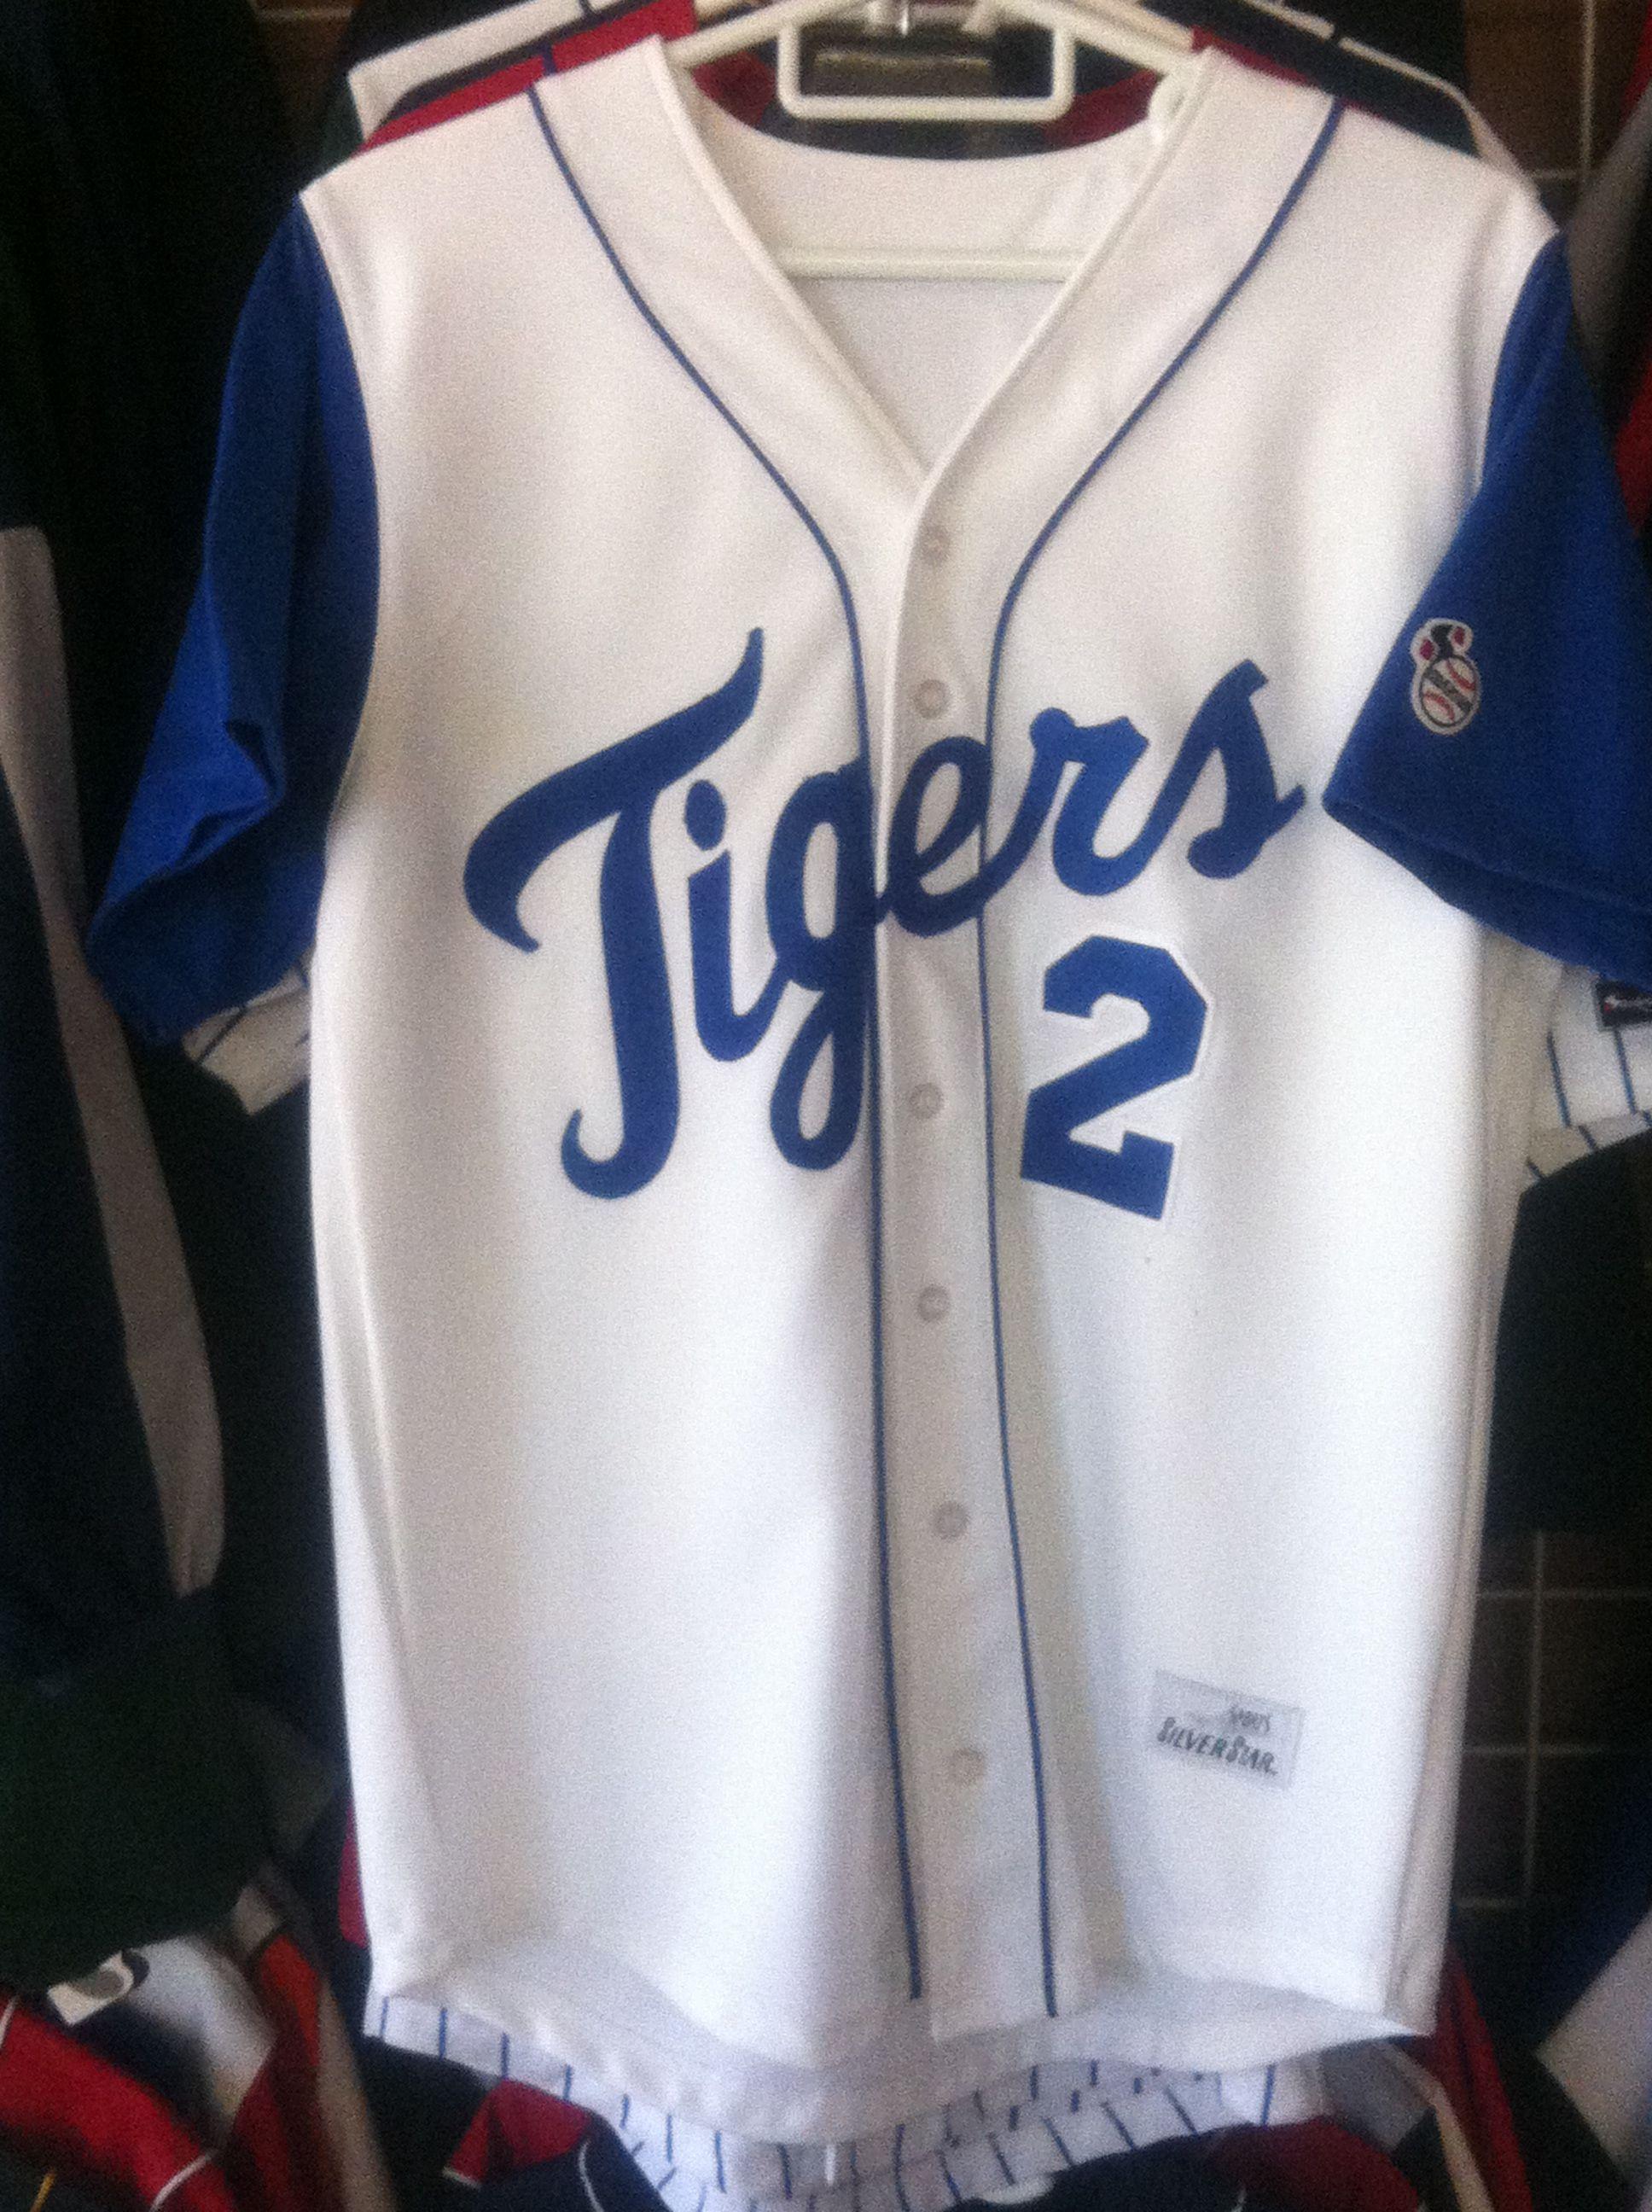 Tigers baseball uniforms We make custom baseball uniforms www ...